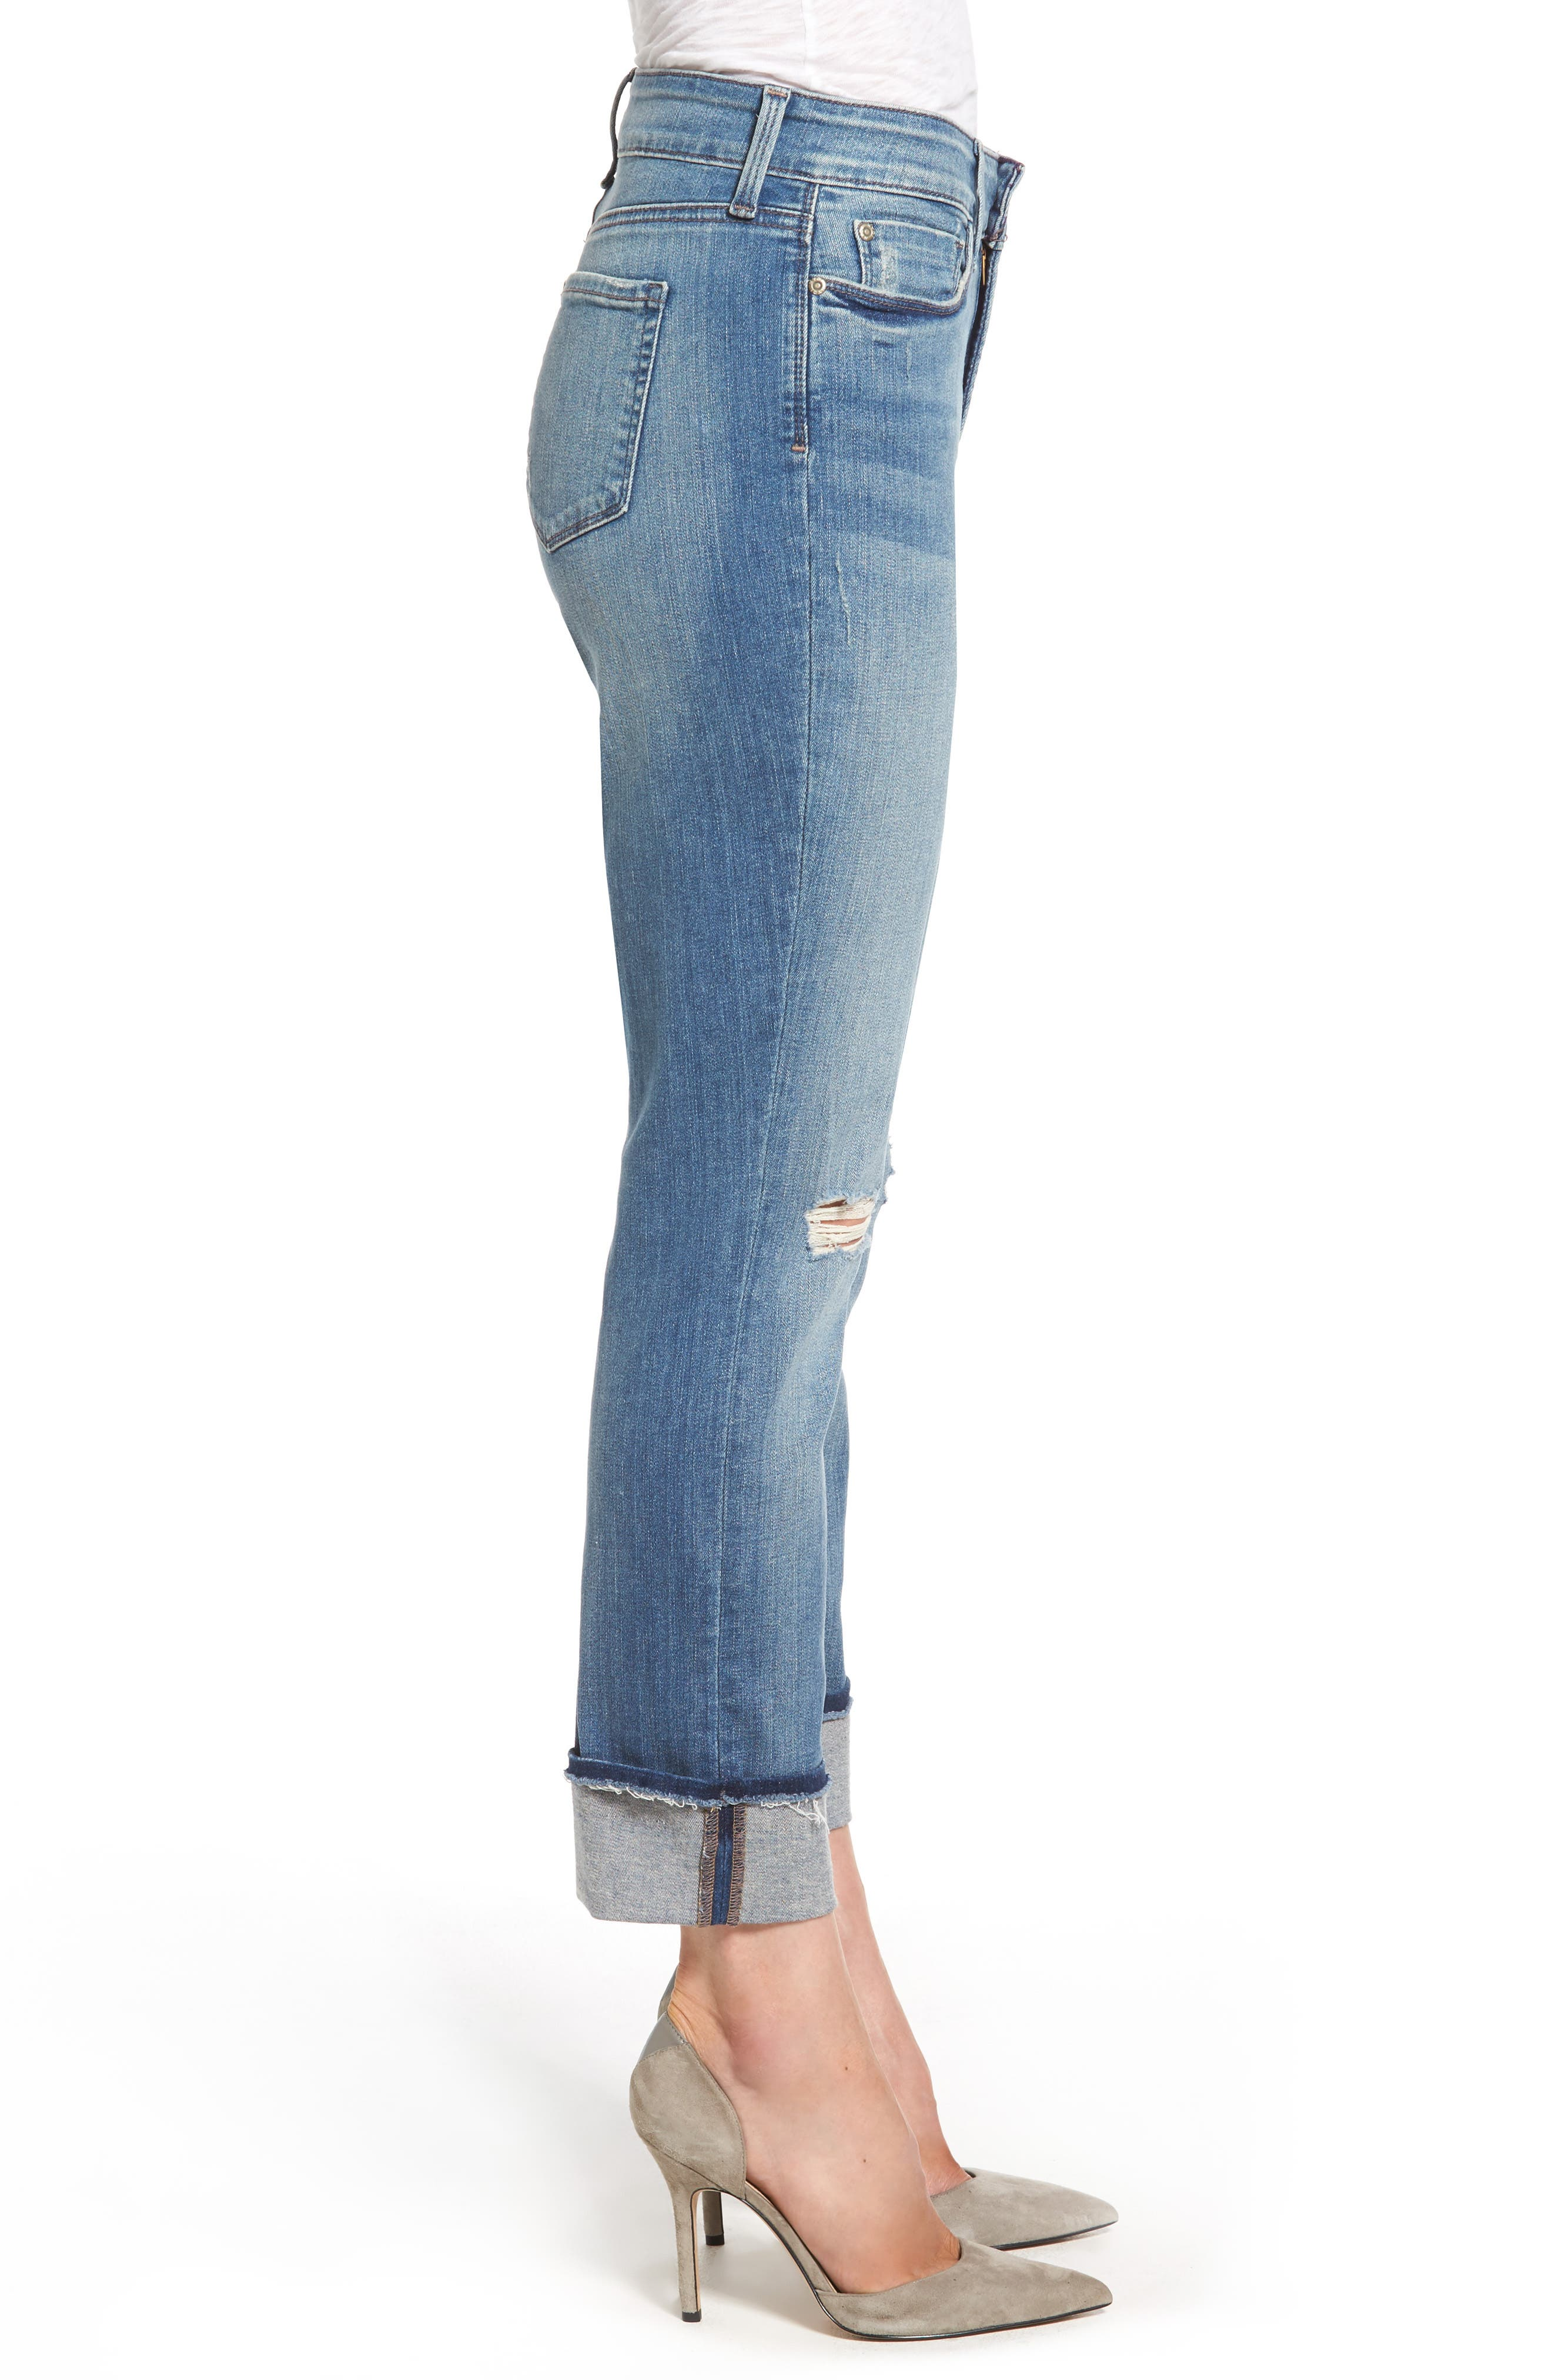 Alternate Image 3  - NYDJ Jessica Distressed Fray Cuff Boyfriend Jeans (Paloma Rip)